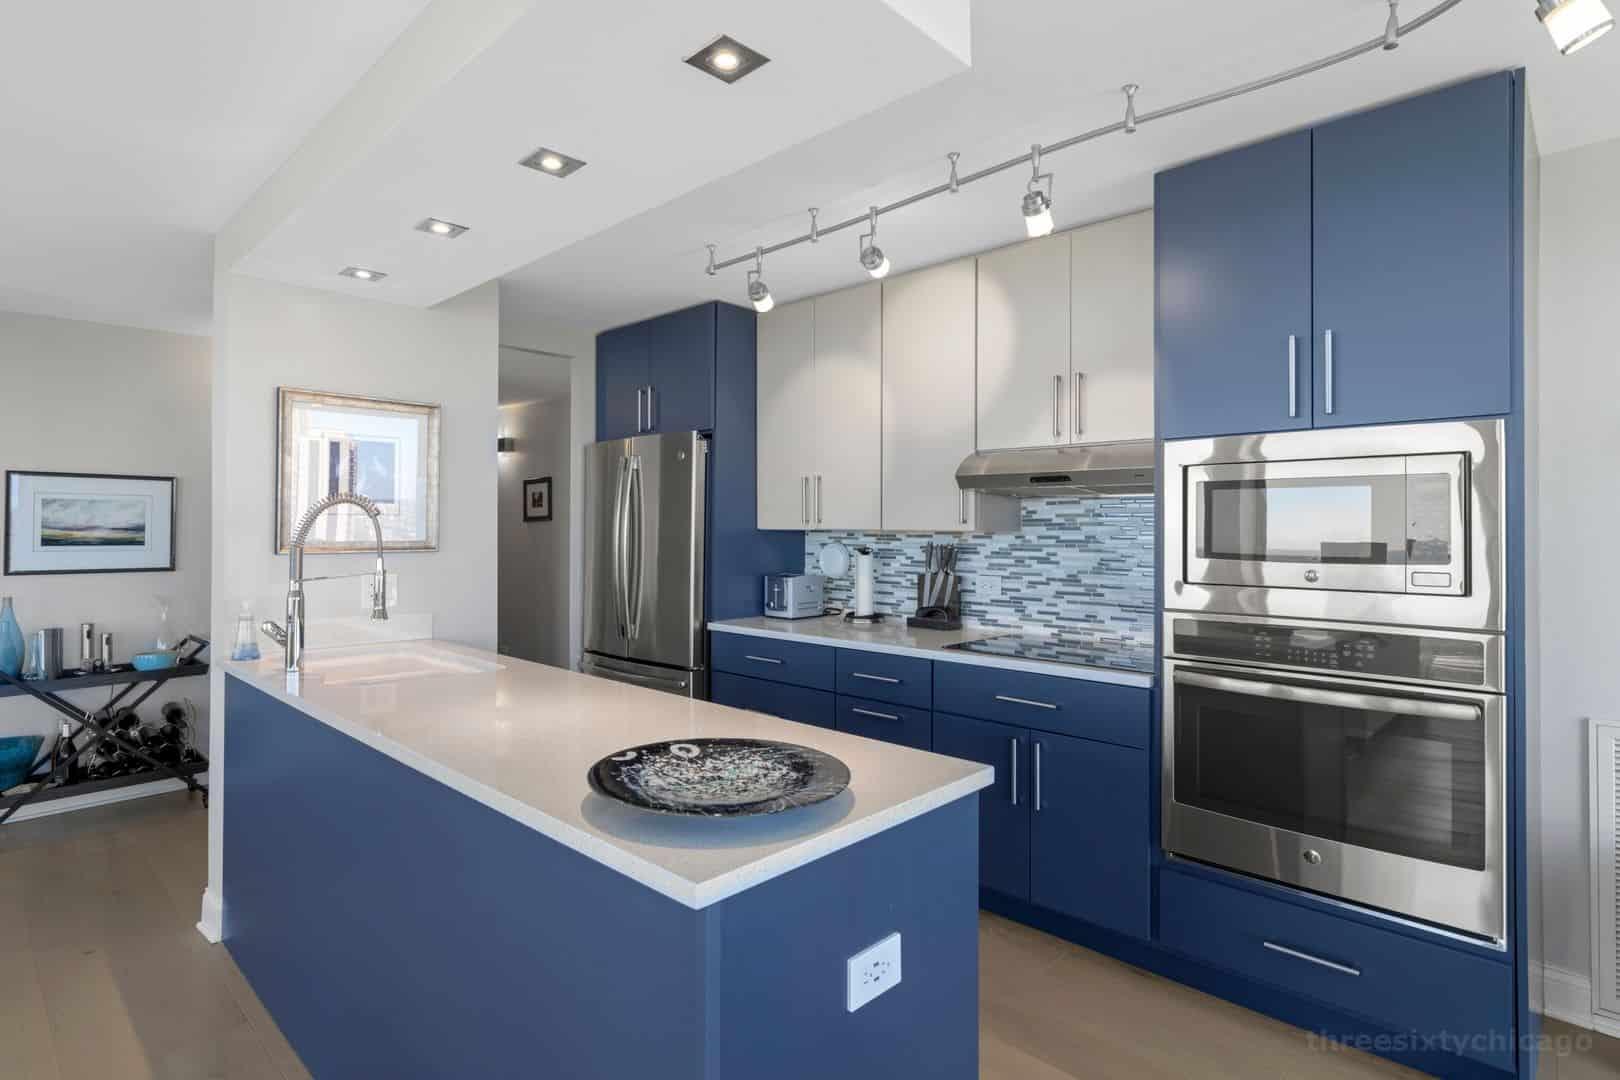 345 W Fullerton Parkway 2901 - Kitchen